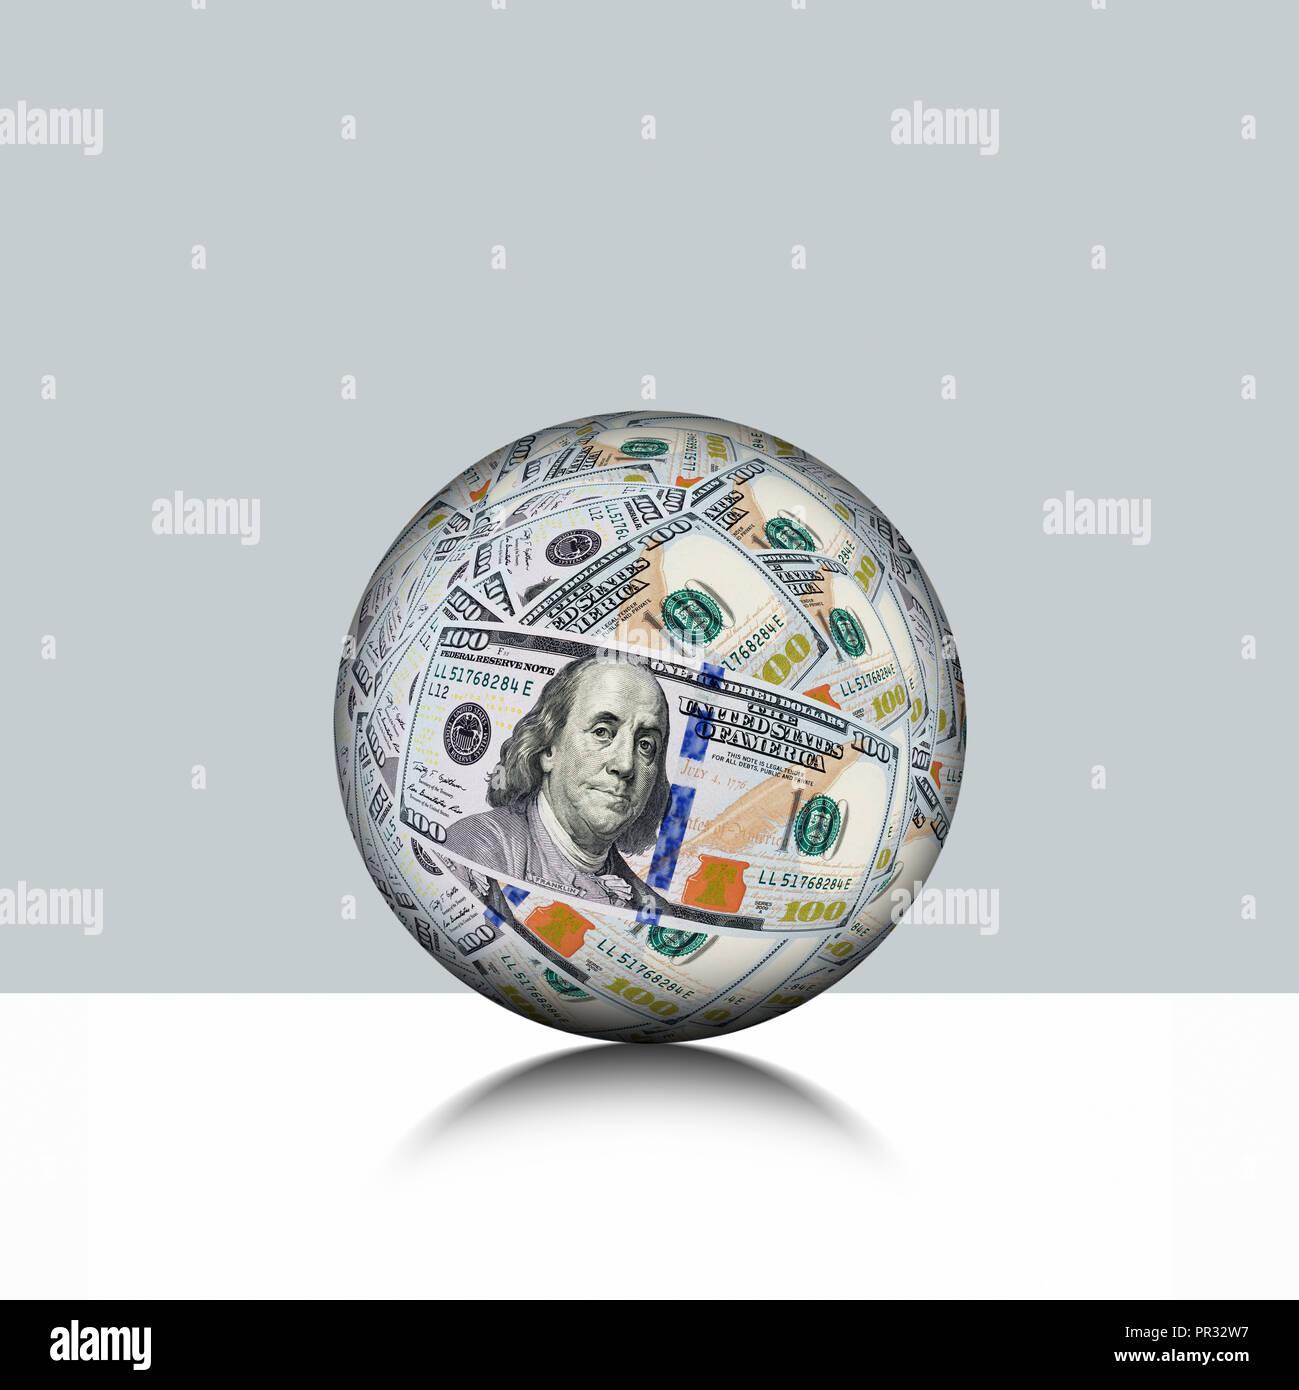 Globale Währung, Kugel Meders von US usd Währung Stockbild